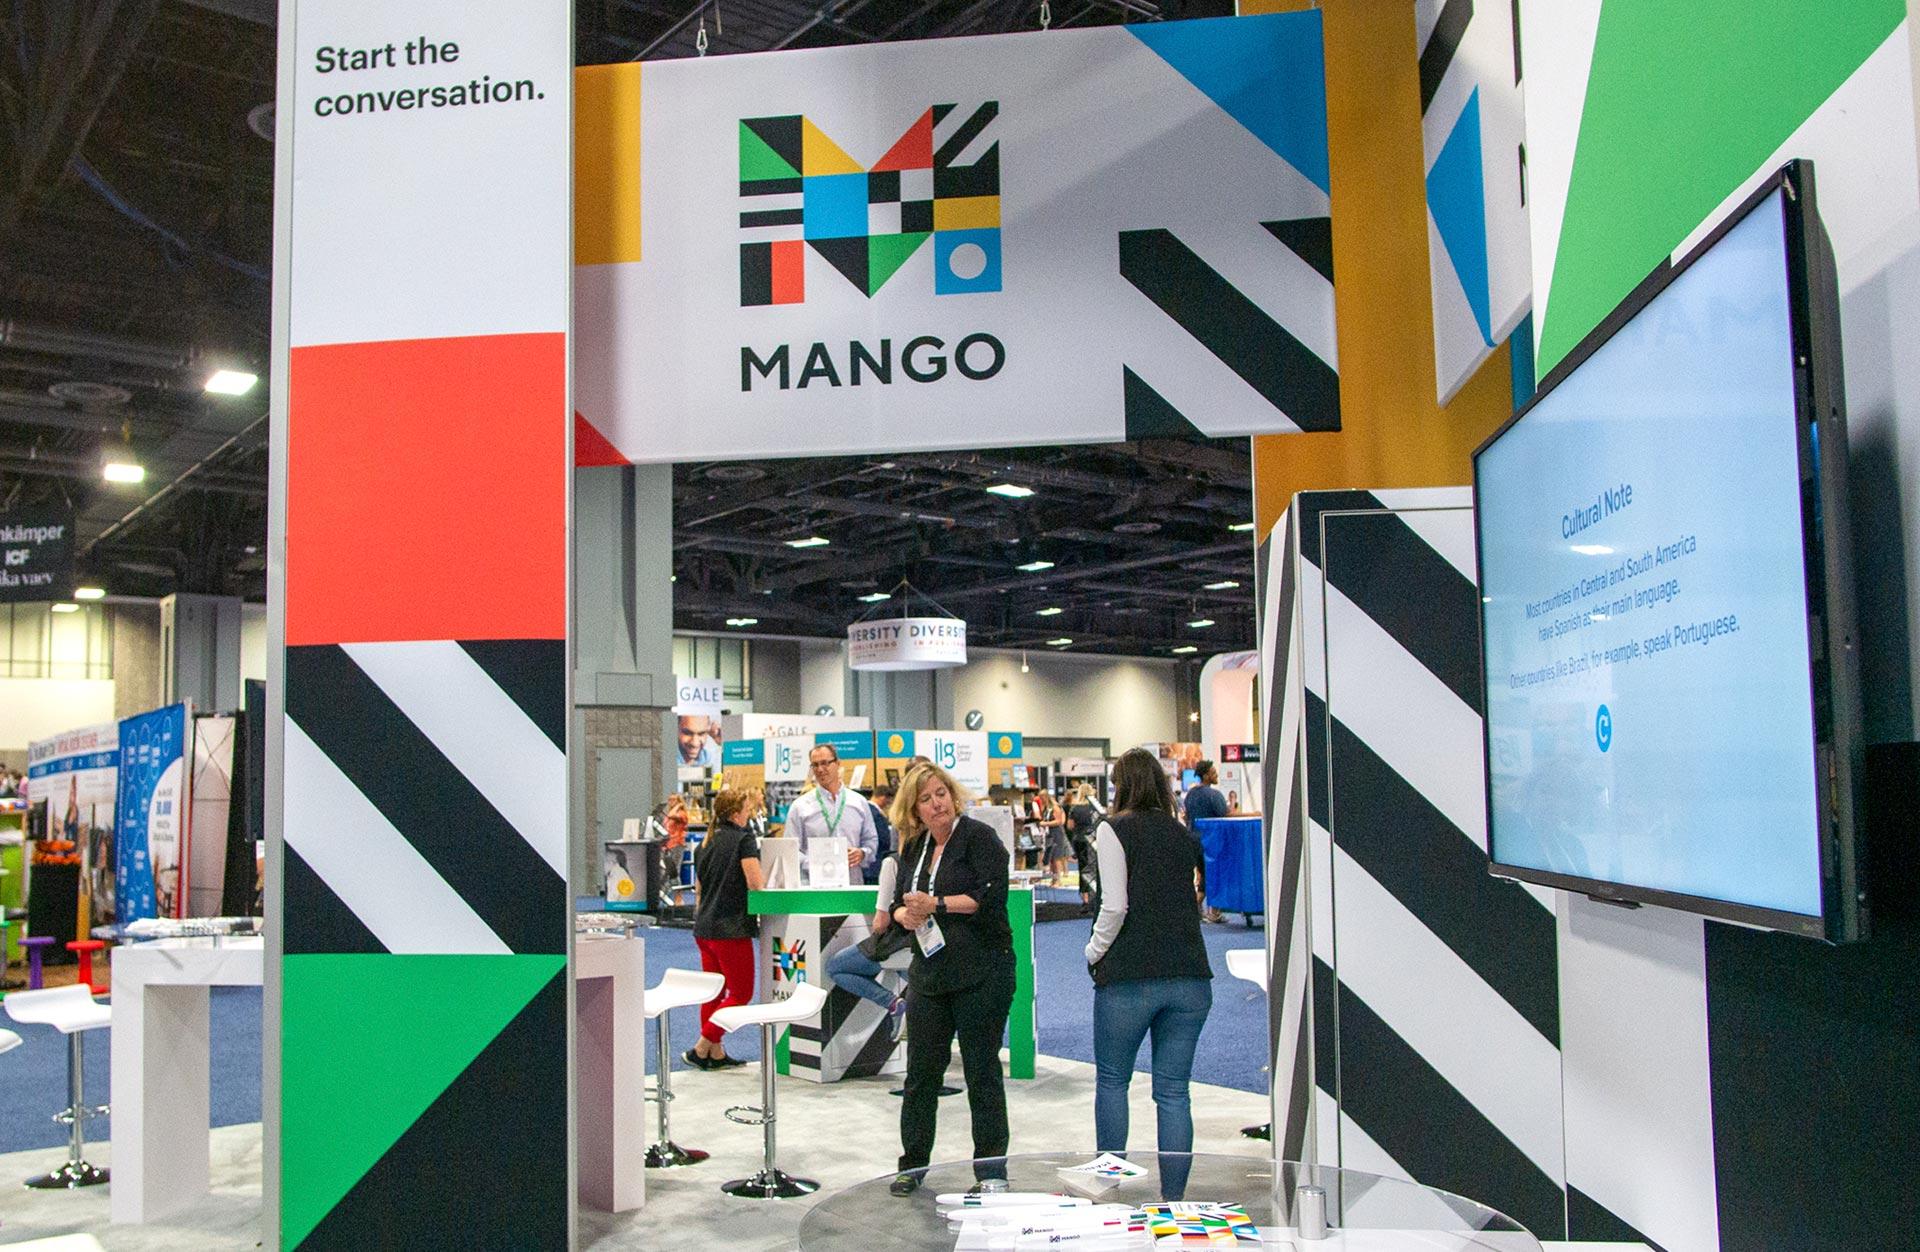 mango-booth-2.jpg